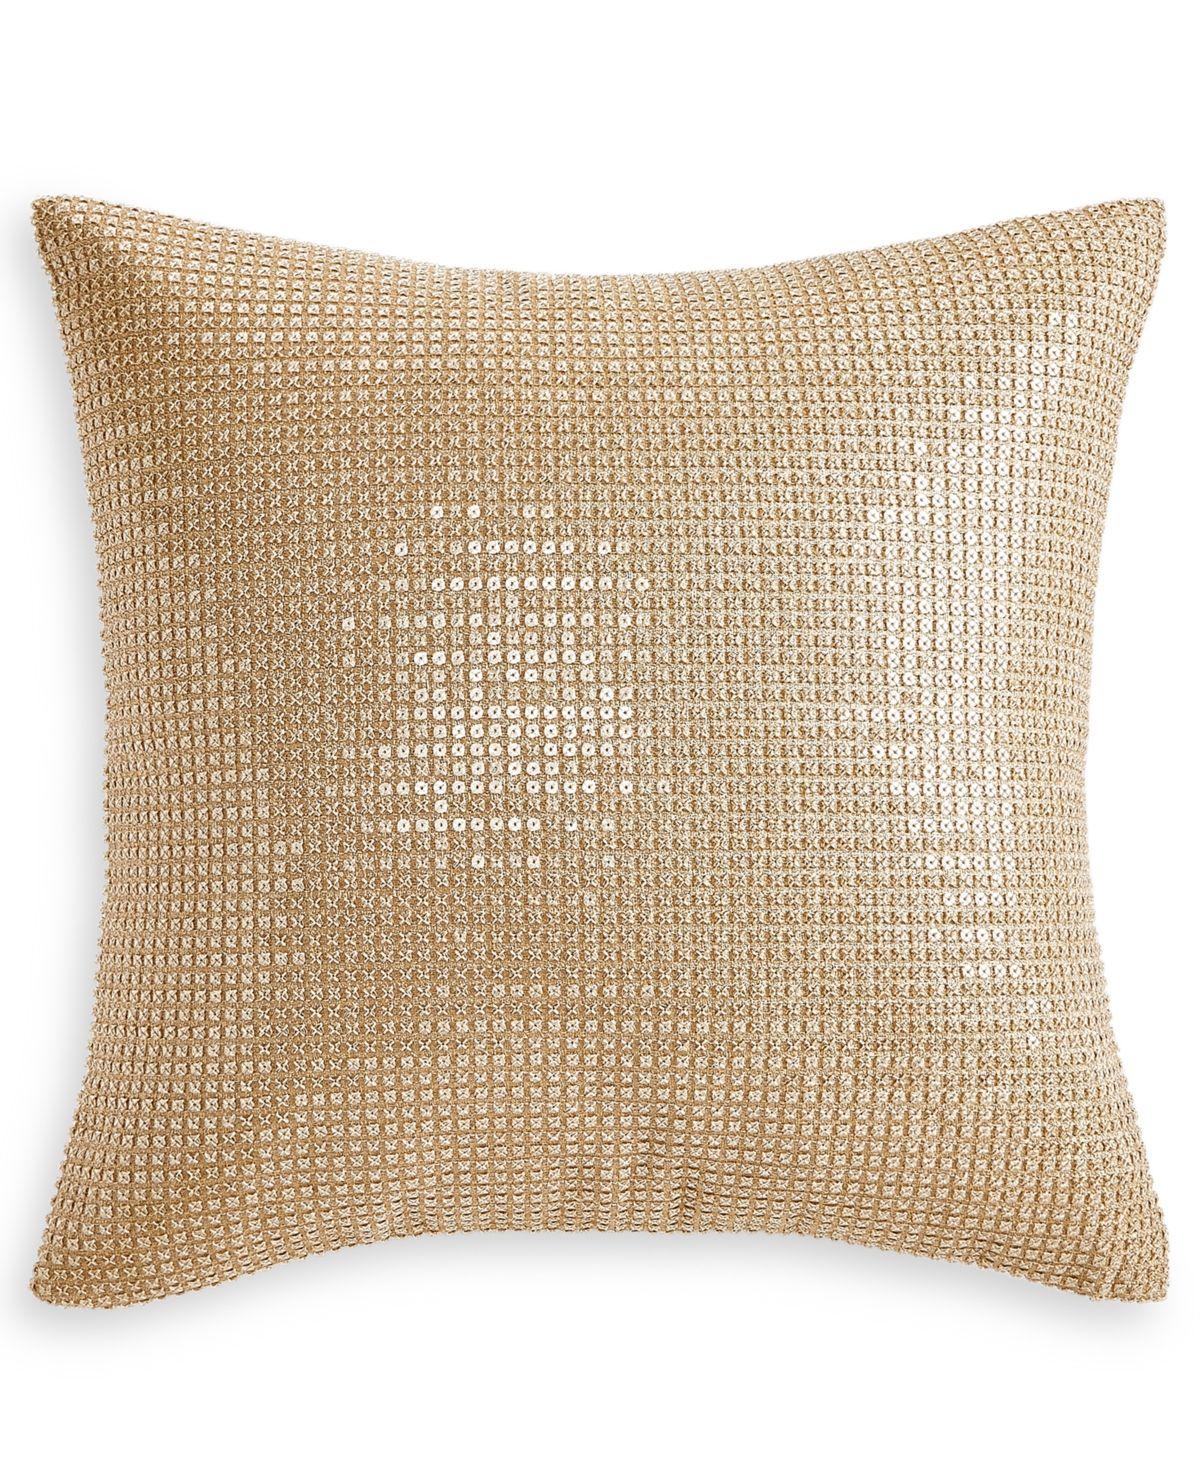 Lacourte Joanie Embroidered 20 Square Decorative Pillow